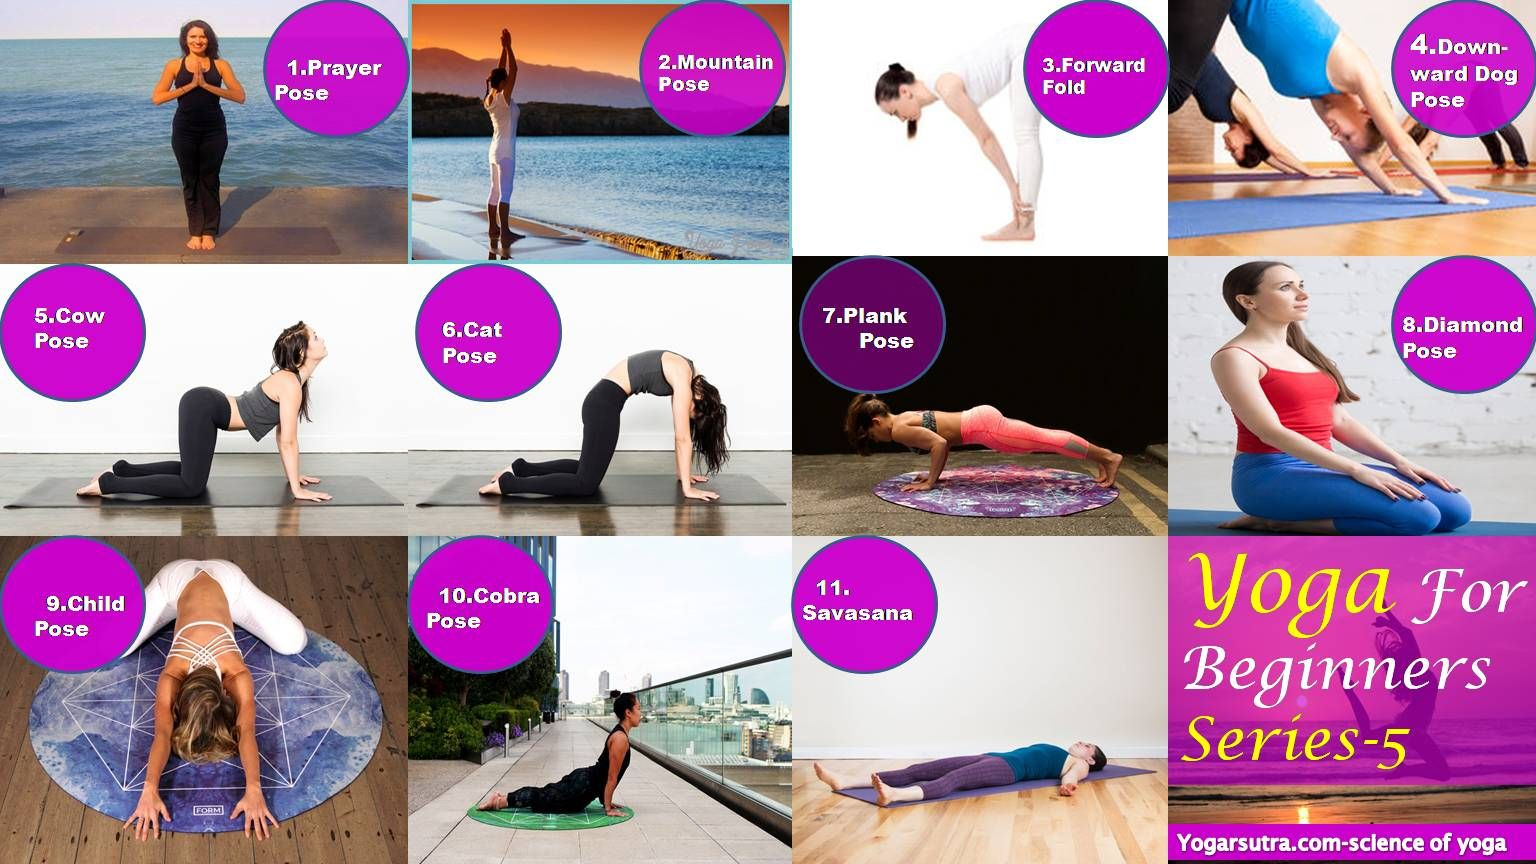 Yoga For Beginners Series 5 The Child Pose Cobra Pose And Savasana Yogarsutra Yoga For Beginners Kids Yoga Poses Yoga For Kids